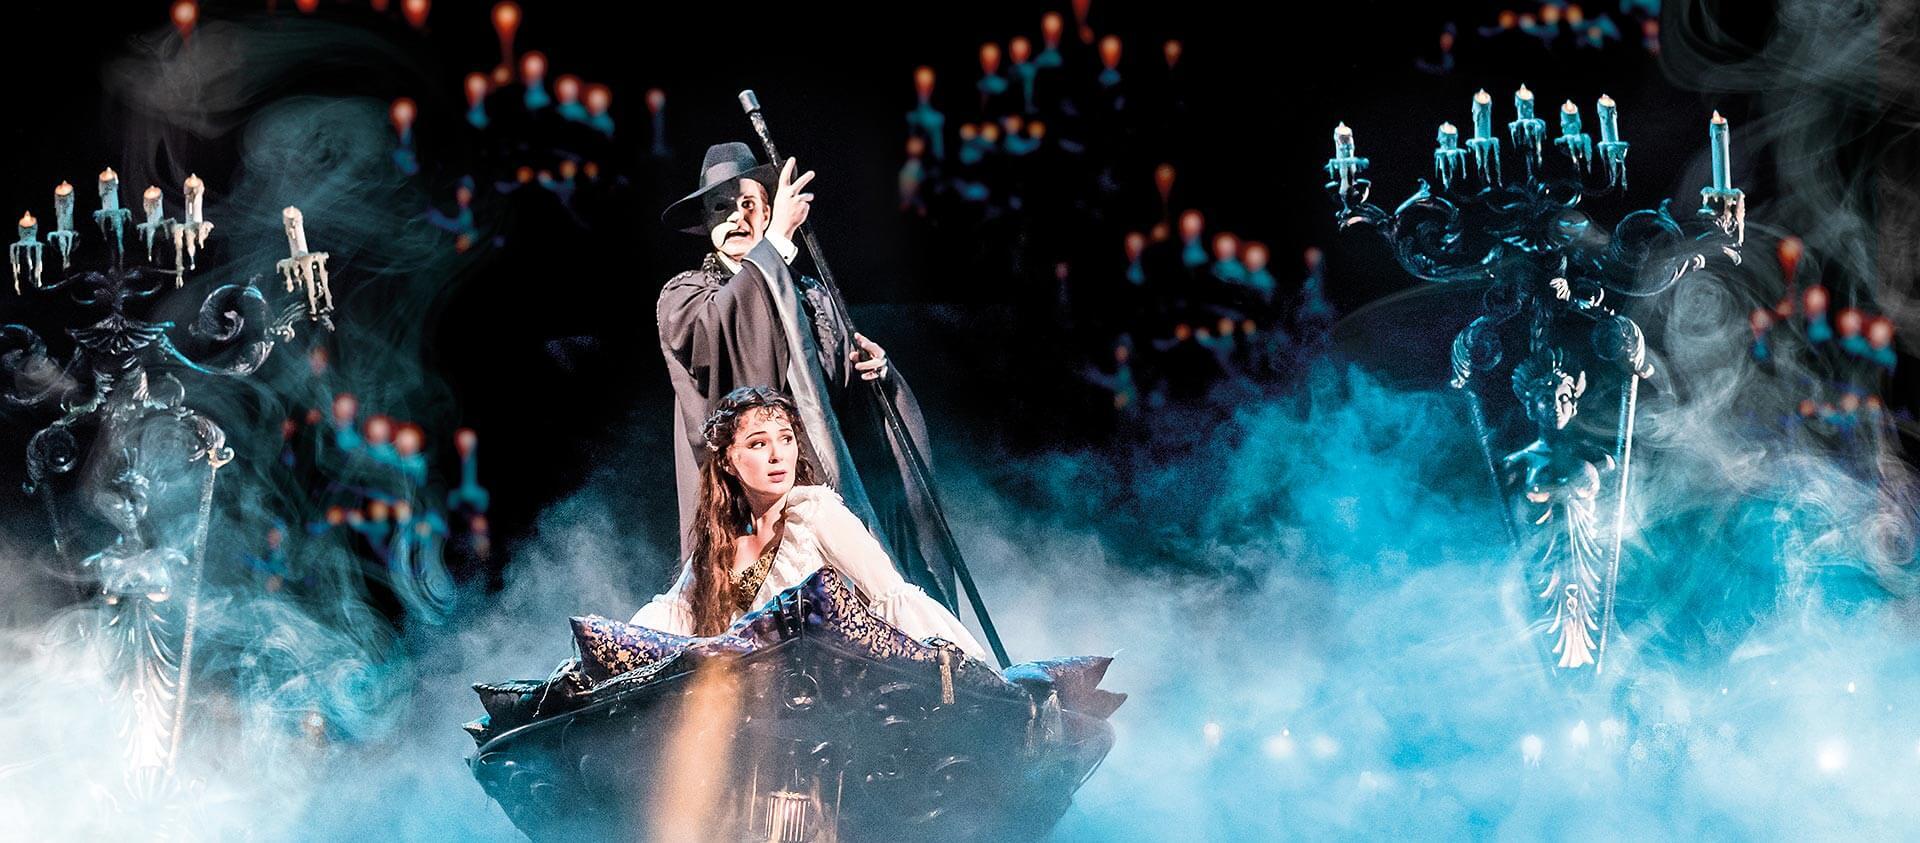 phantom-of-the-opera-1 mother's day singapore